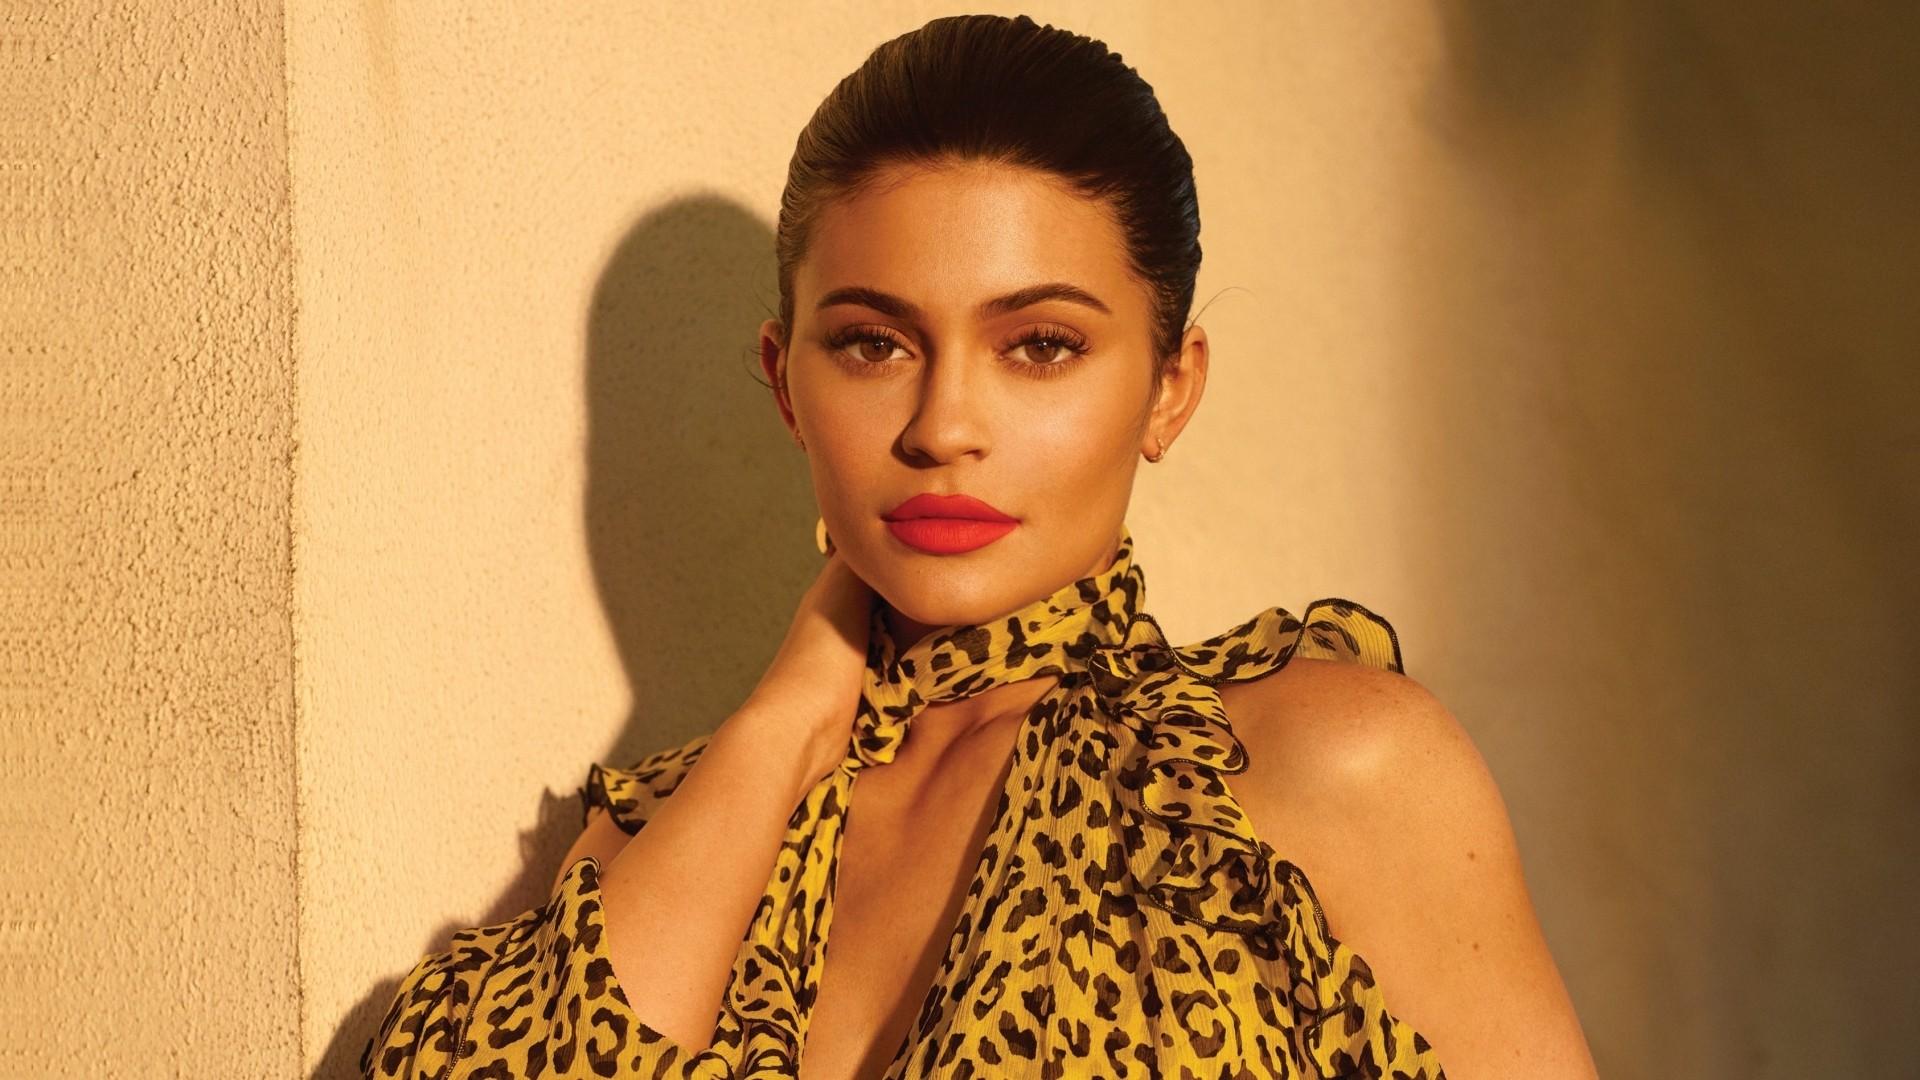 Kylie Jenner High Quality